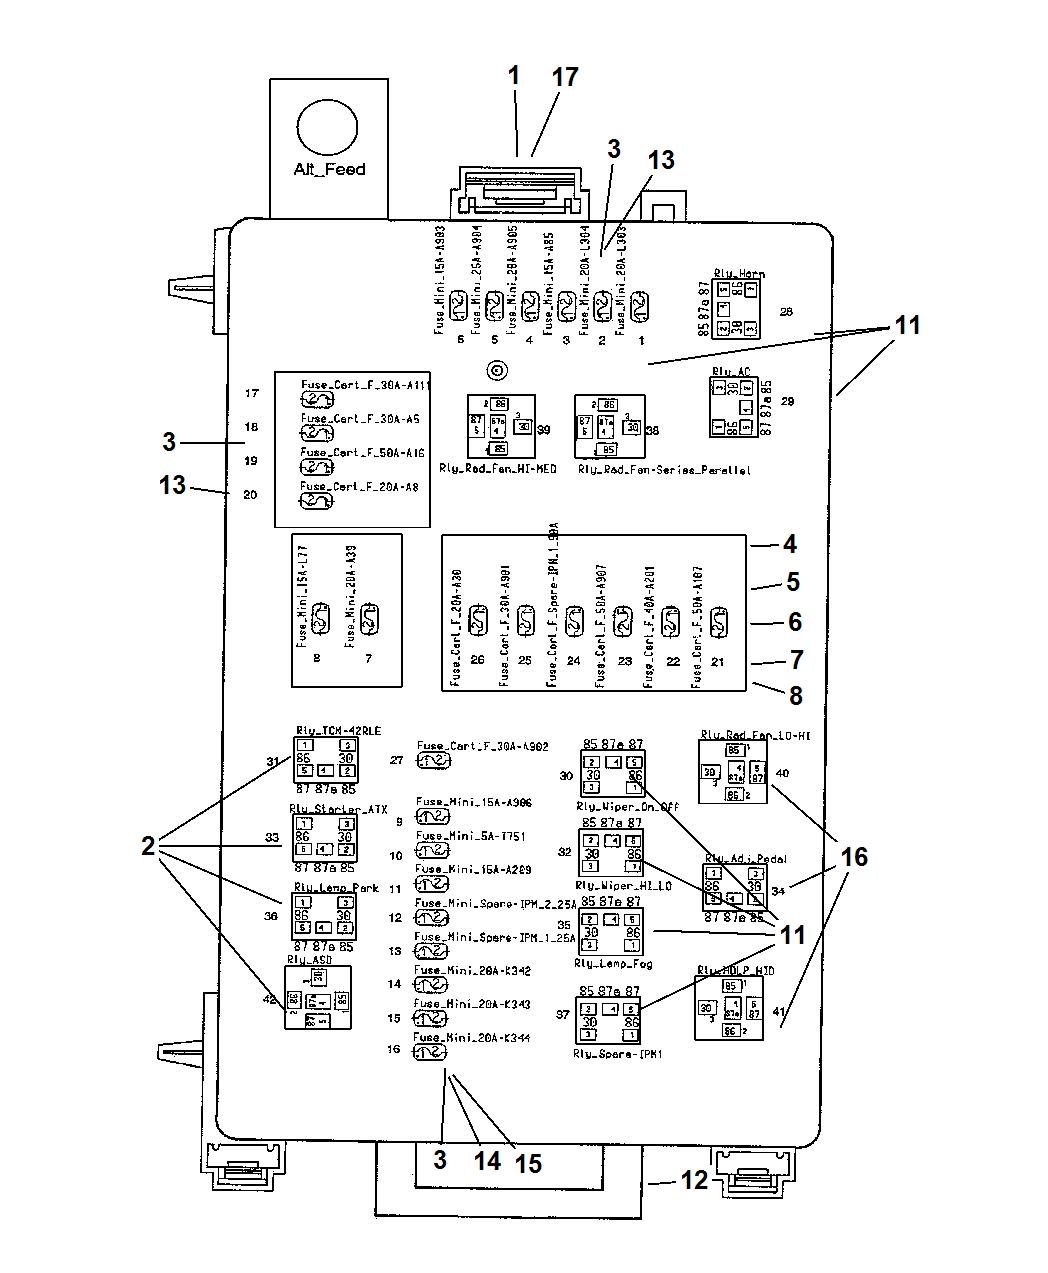 Strange 2006 Dodge Charger Fuse Box Diagram Wiring Library Wiring Cloud Timewinrebemohammedshrineorg